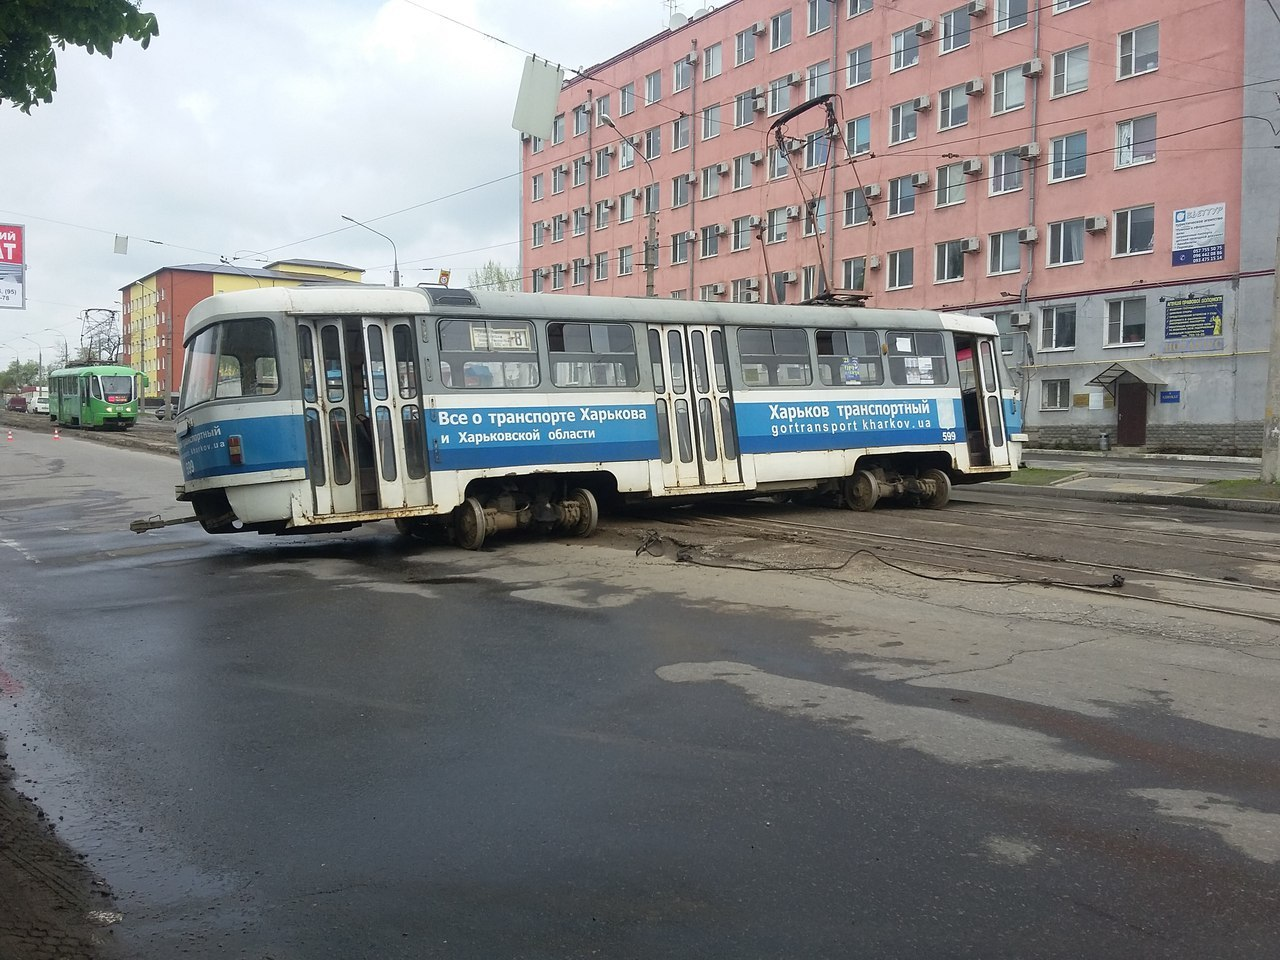 Харьков — столица трамвайного дрифта | Пикабу